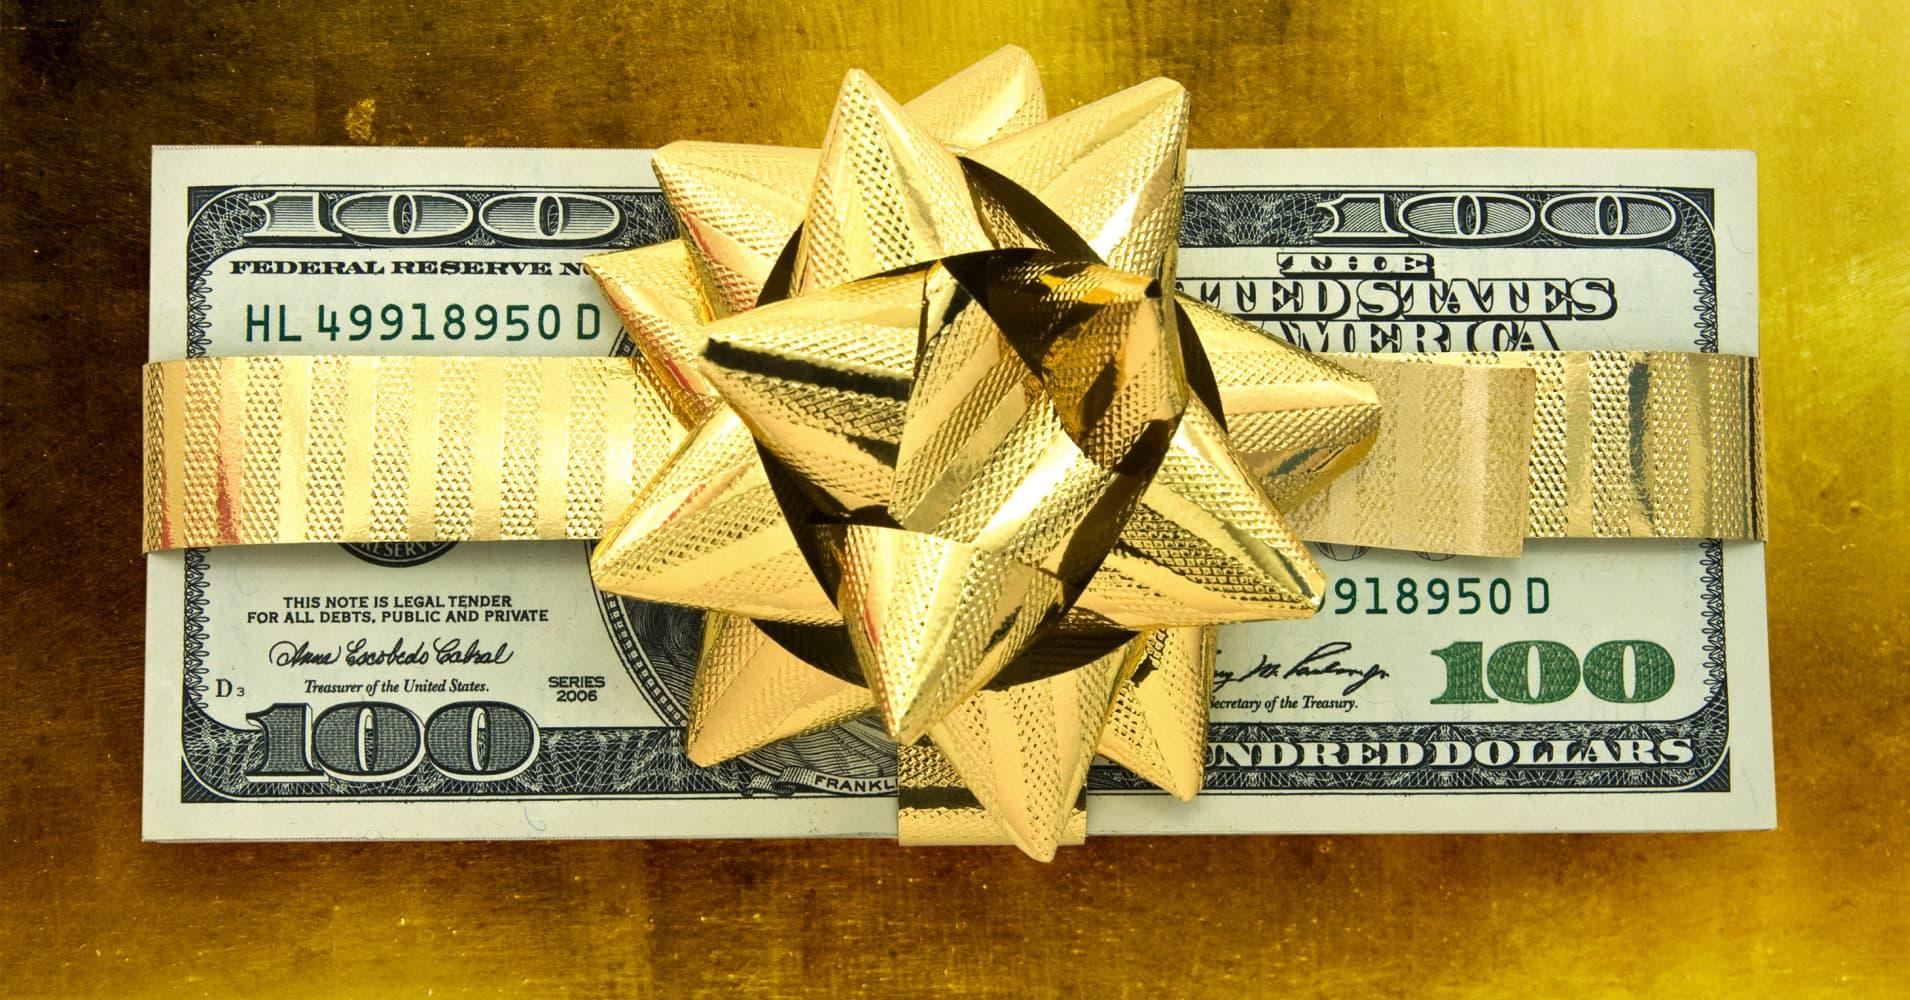 Deutsche Bank board member says staff not quitting over 80 percent bonus cuts